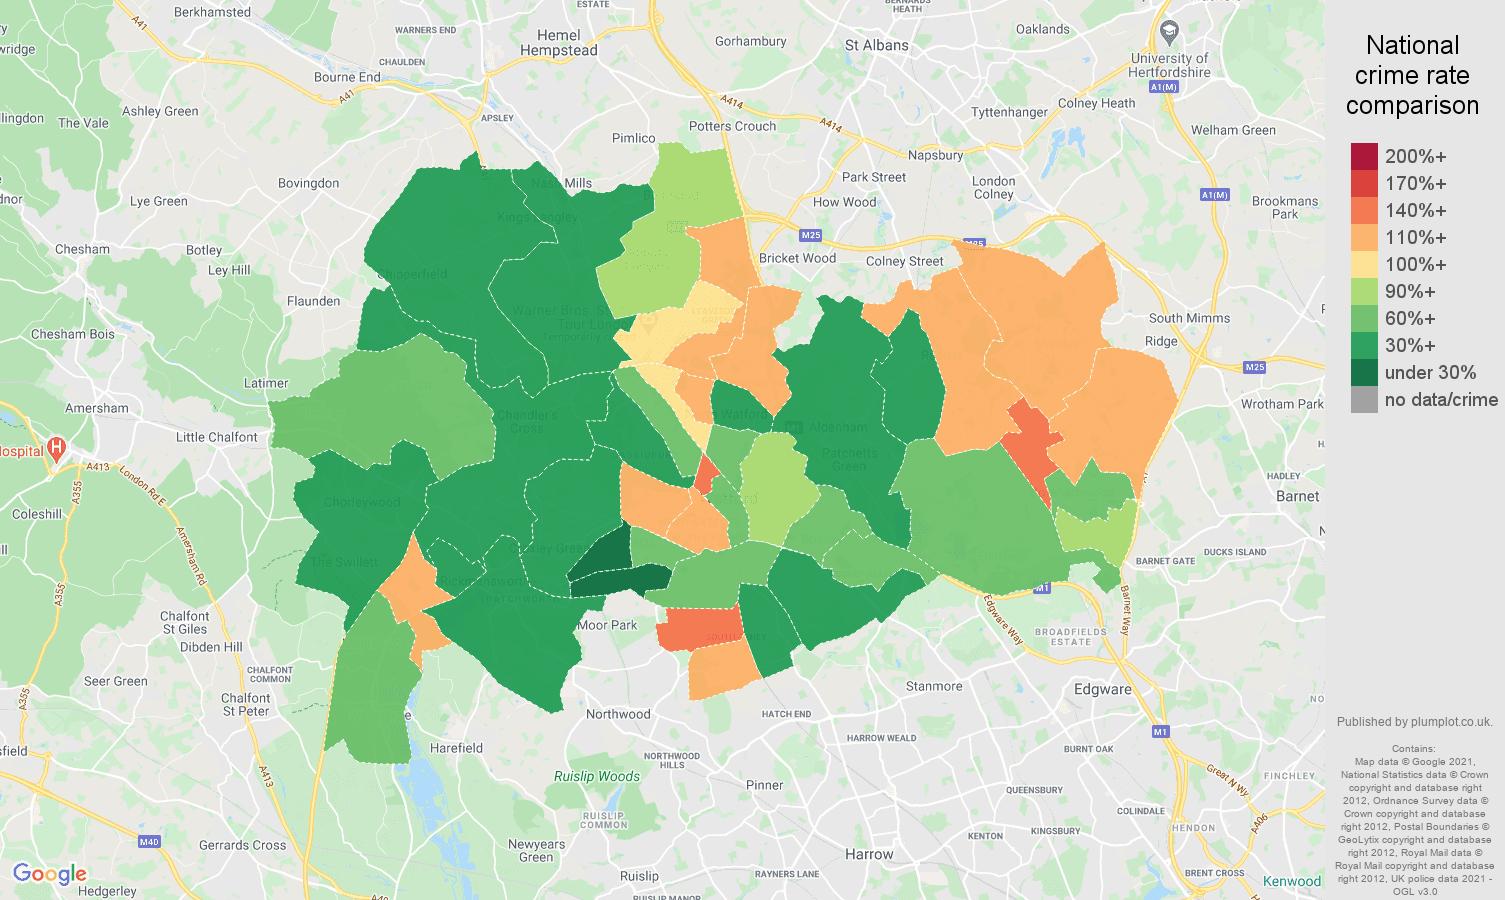 Watford violent crime rate comparison map